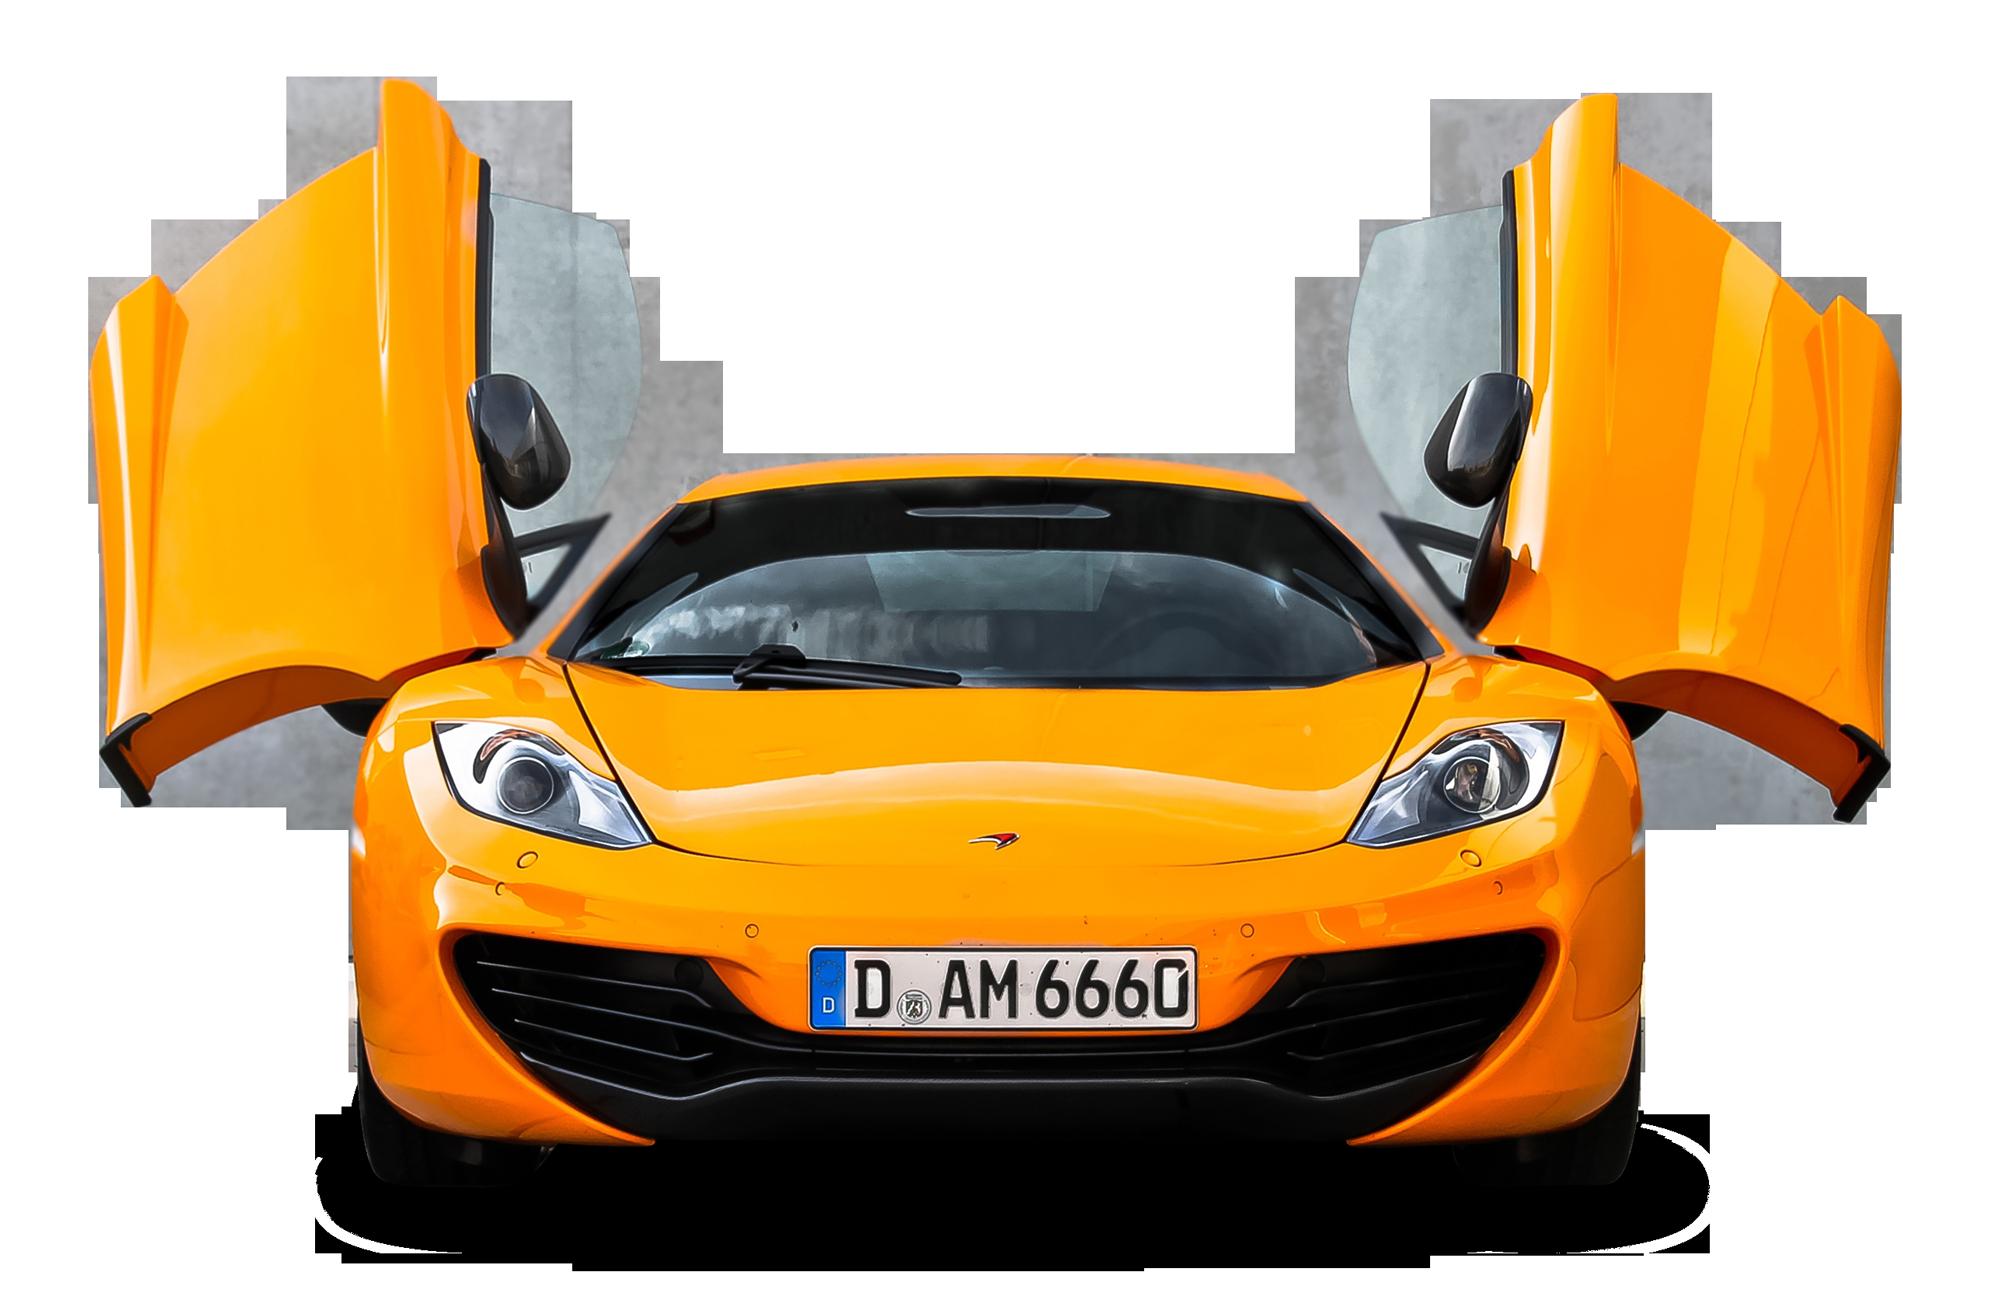 Car Png Transparent - Car, Transparent background PNG HD thumbnail